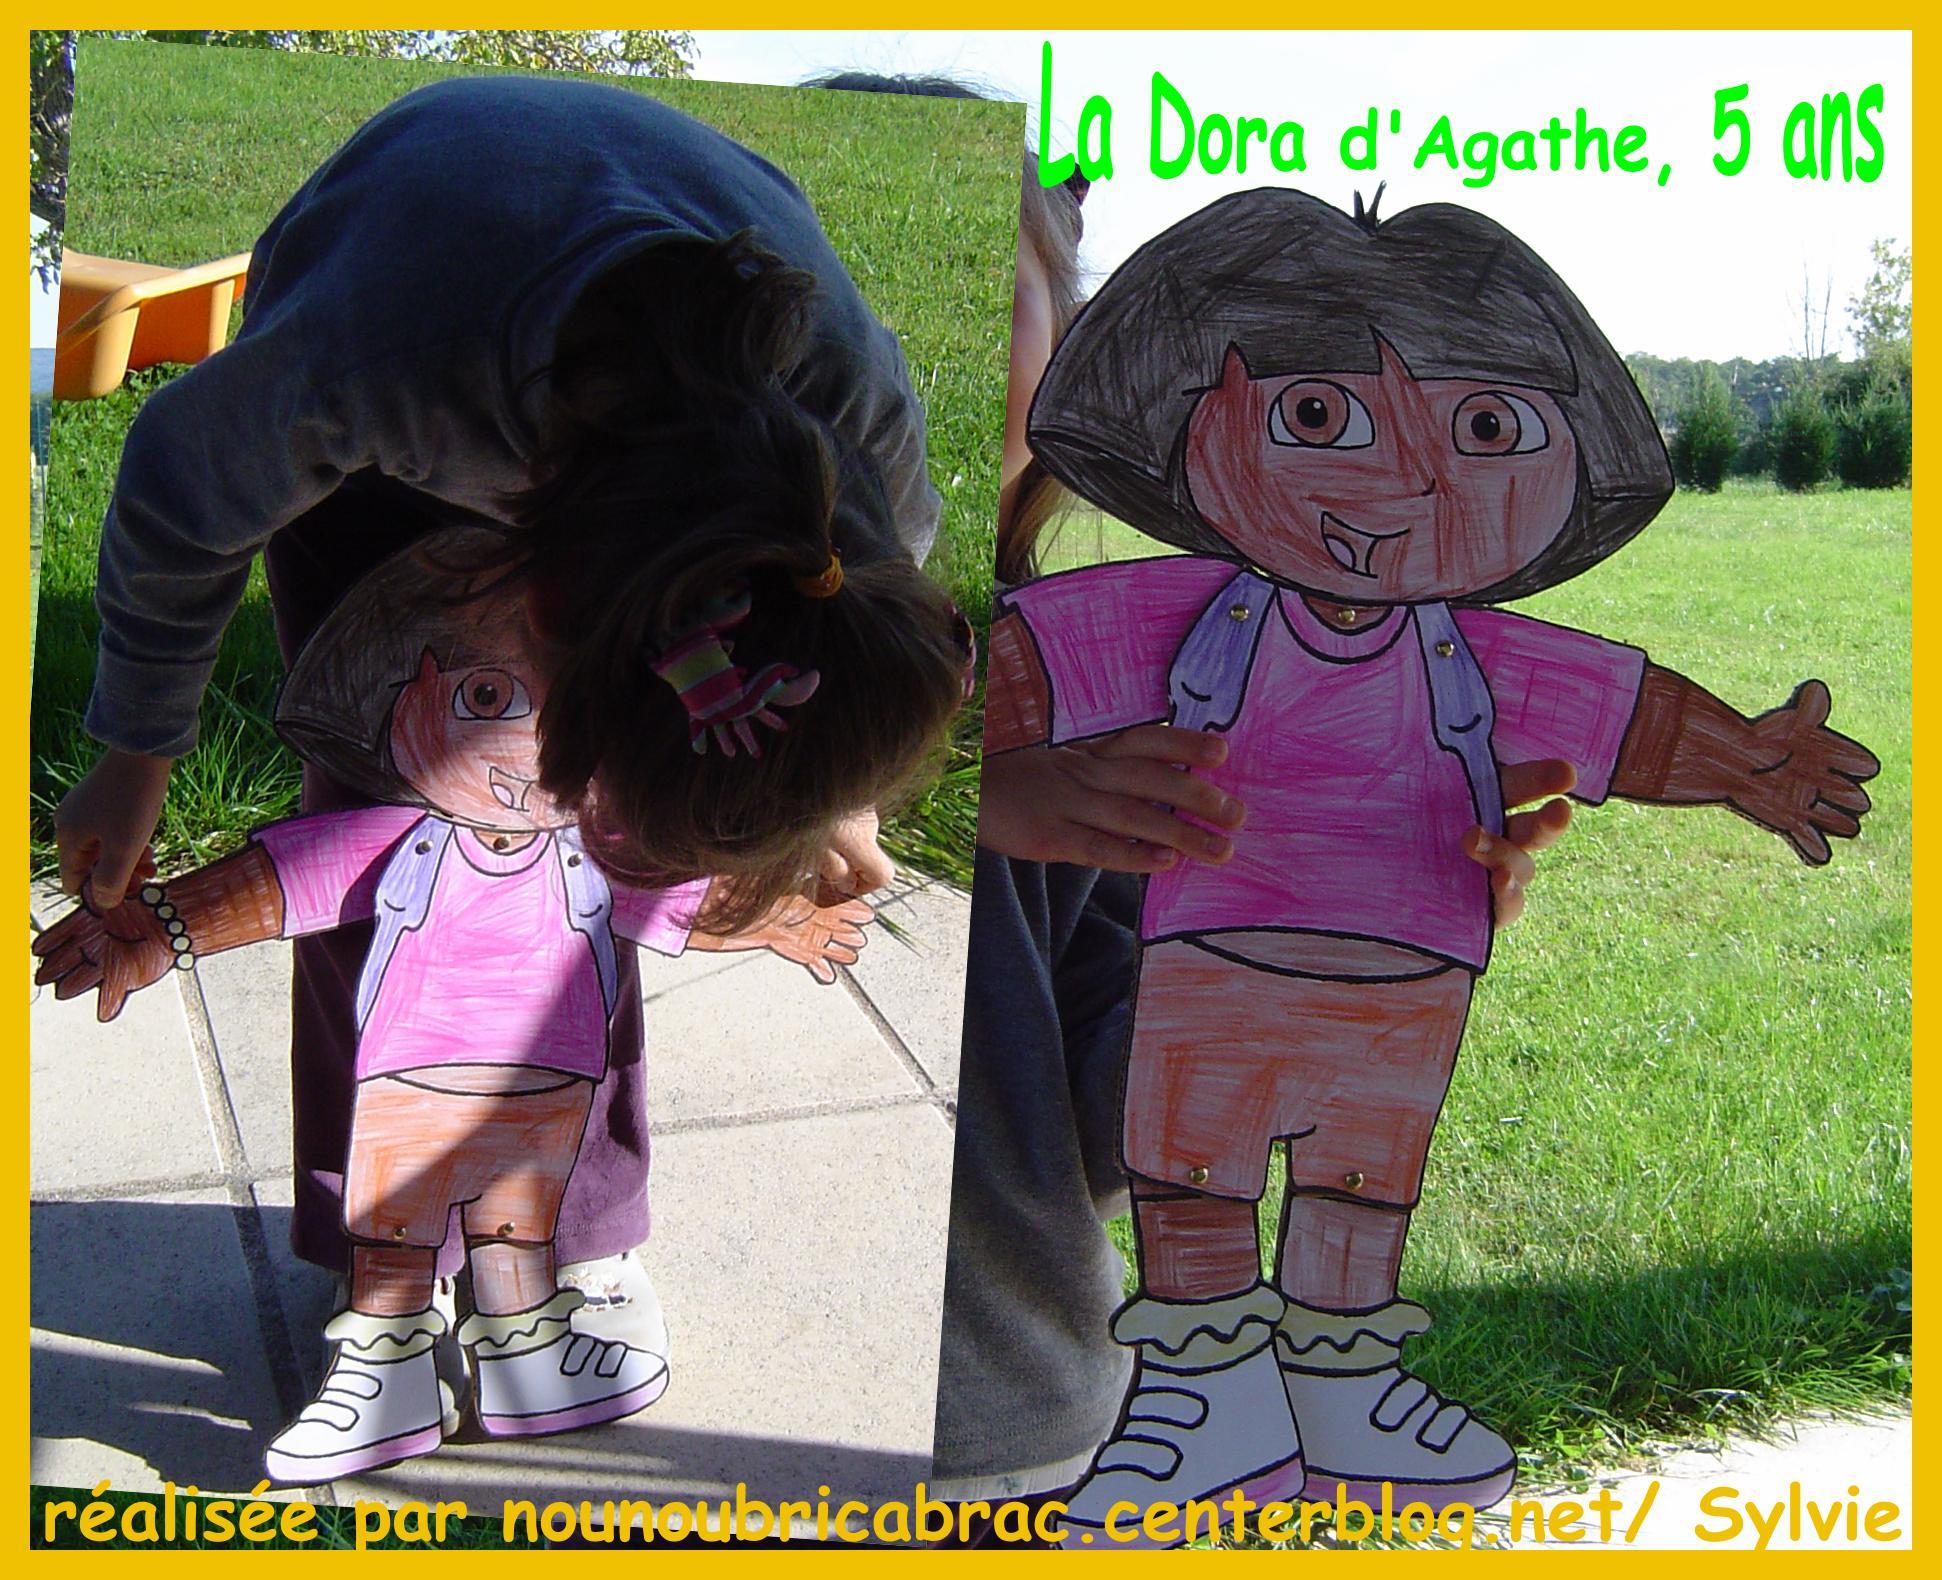 Marionnette Dora d'Agathe